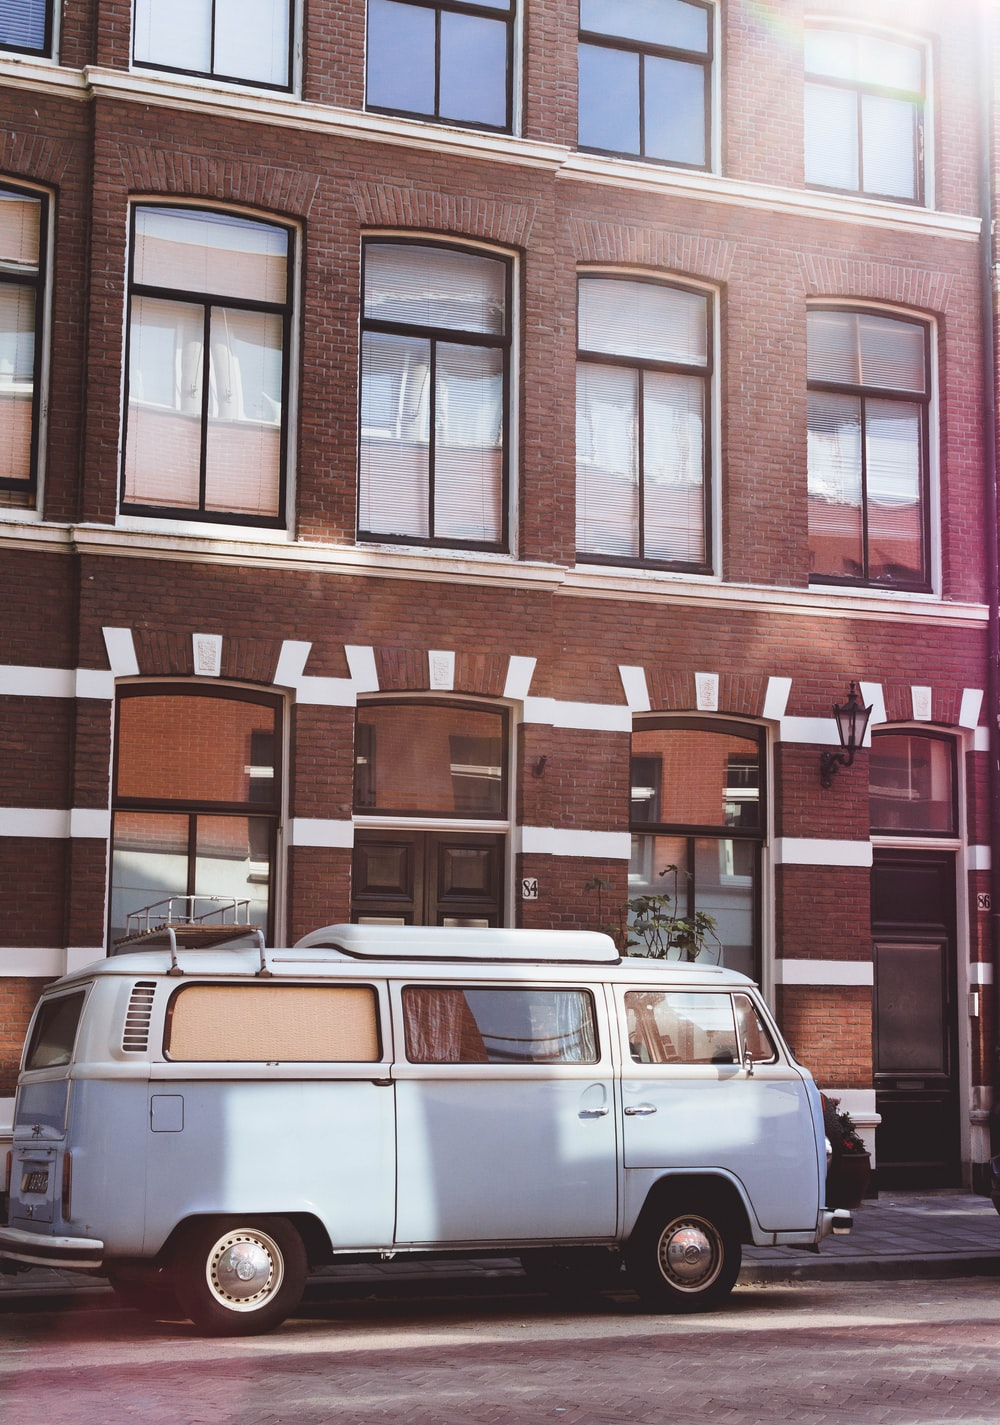 white van parking near building